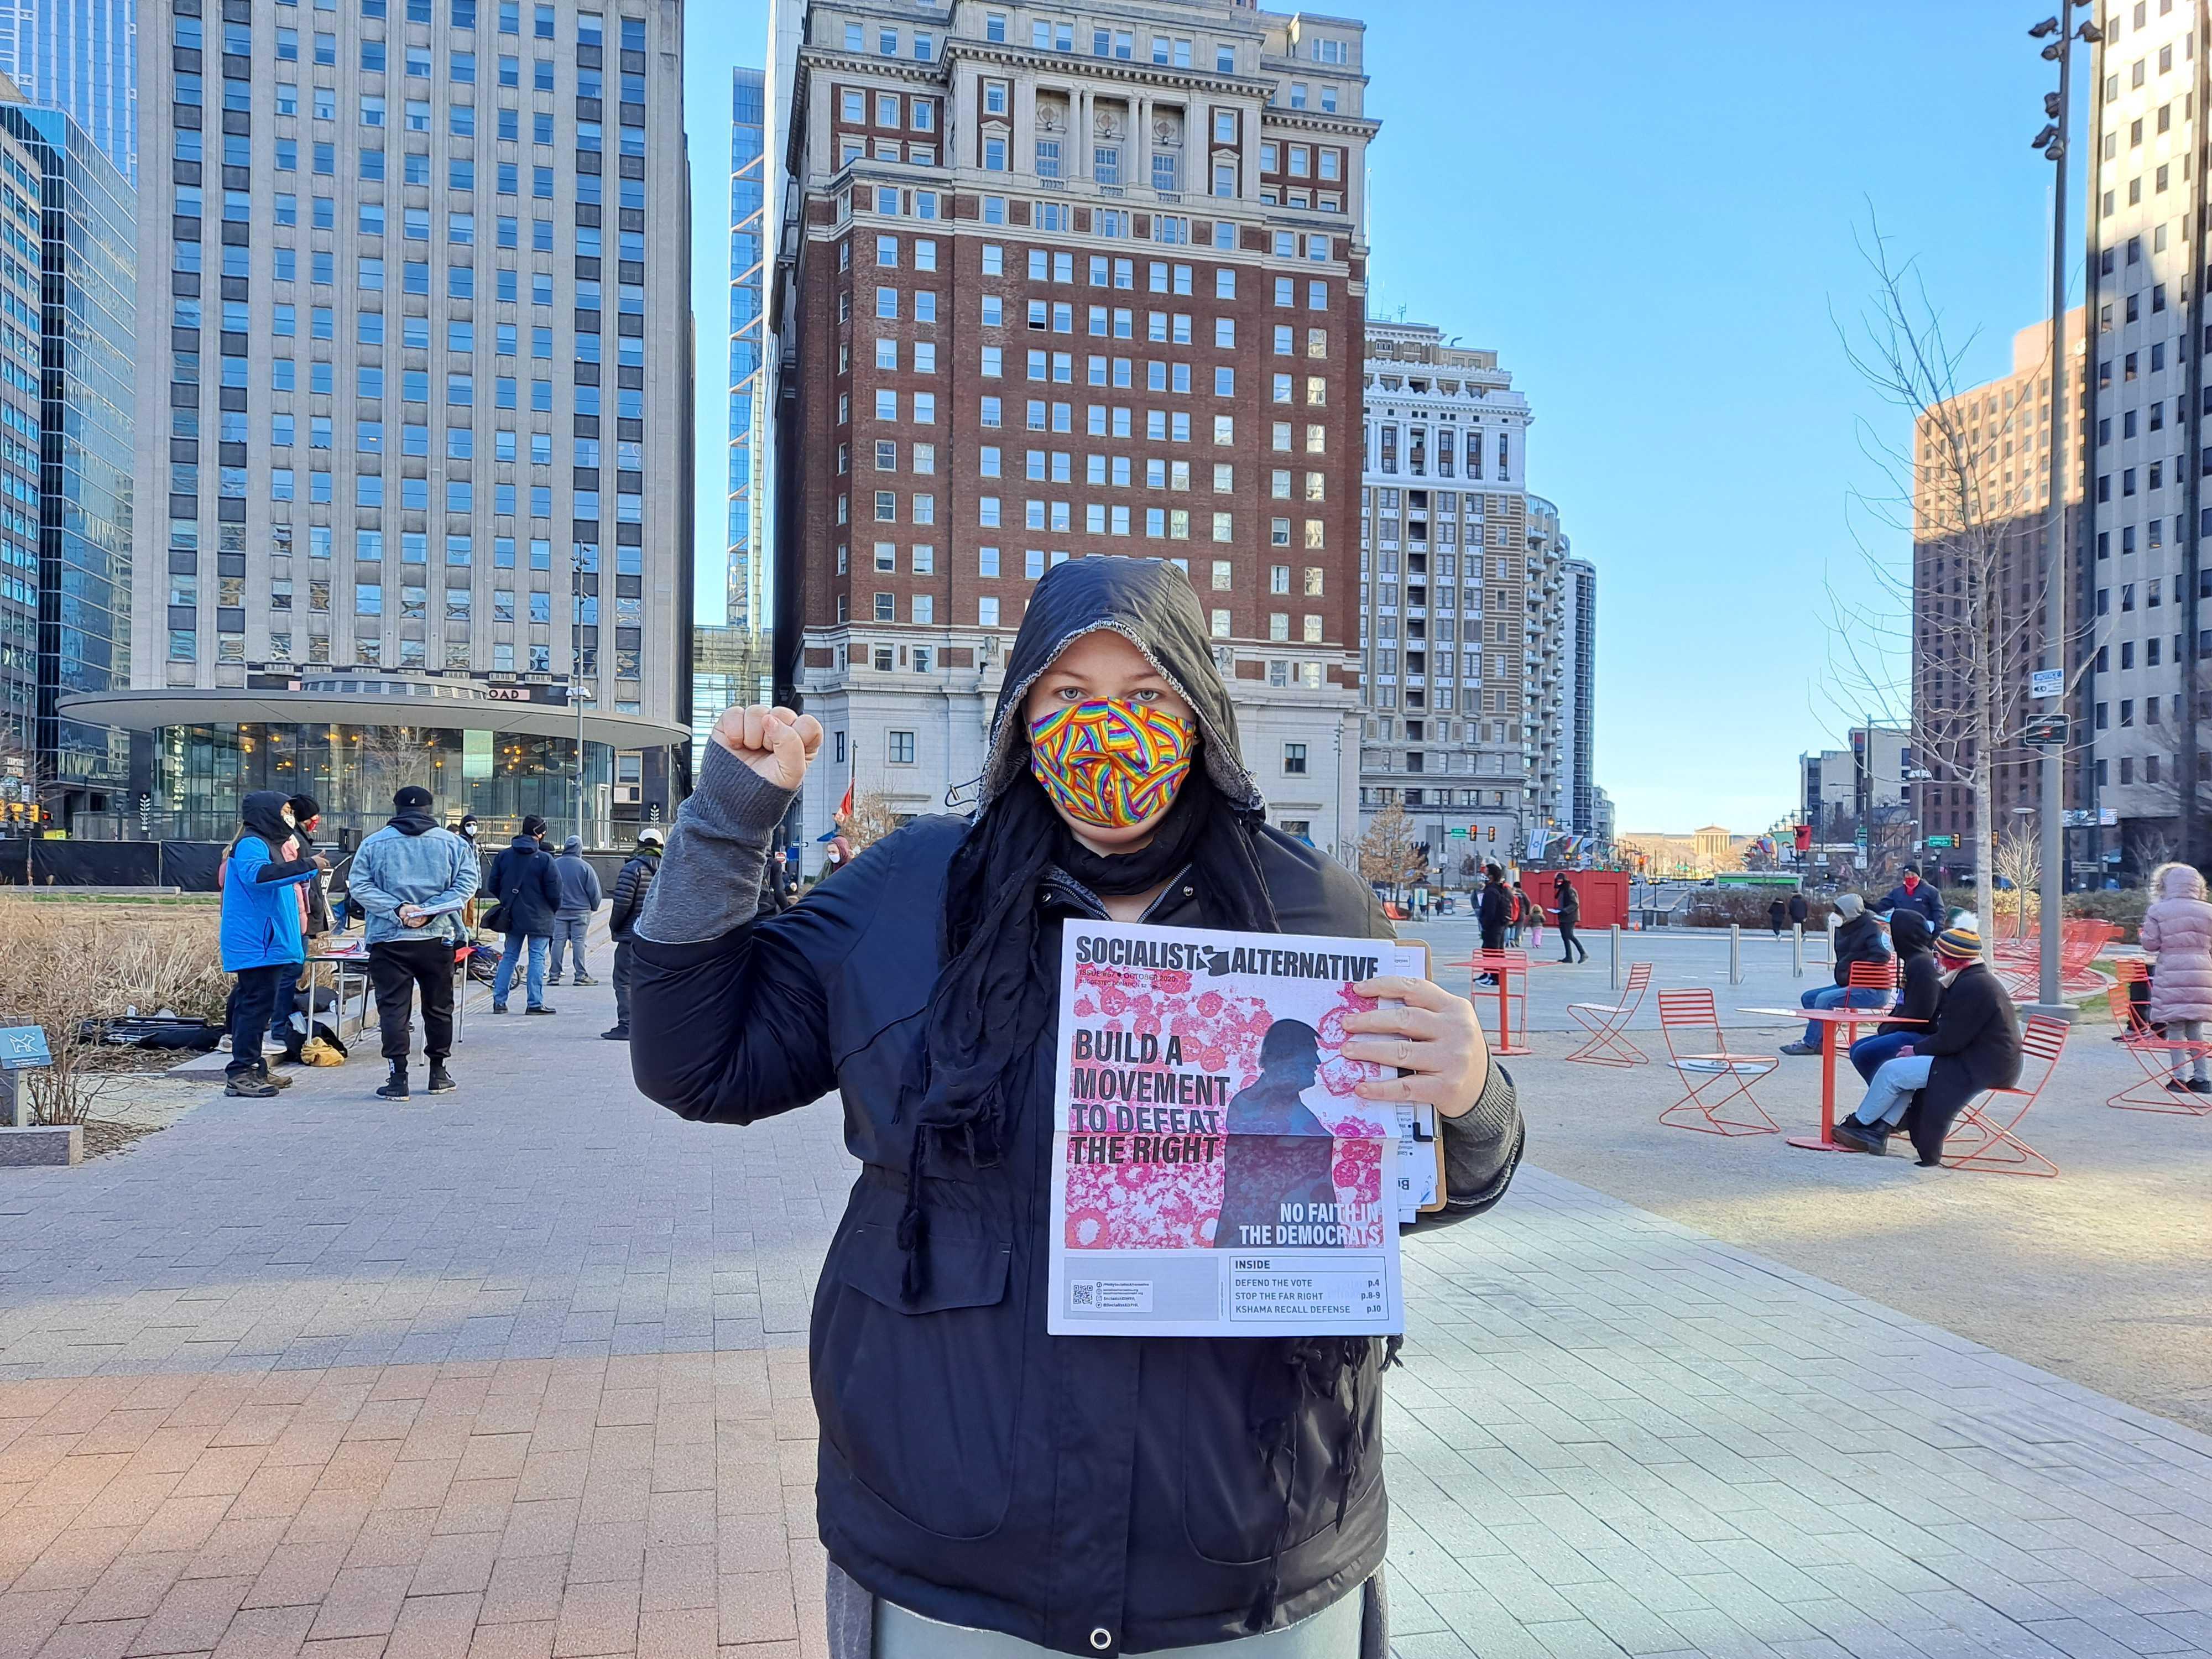 Nat Dekok stands outside near City Hall at a Socialist Alternative meeting